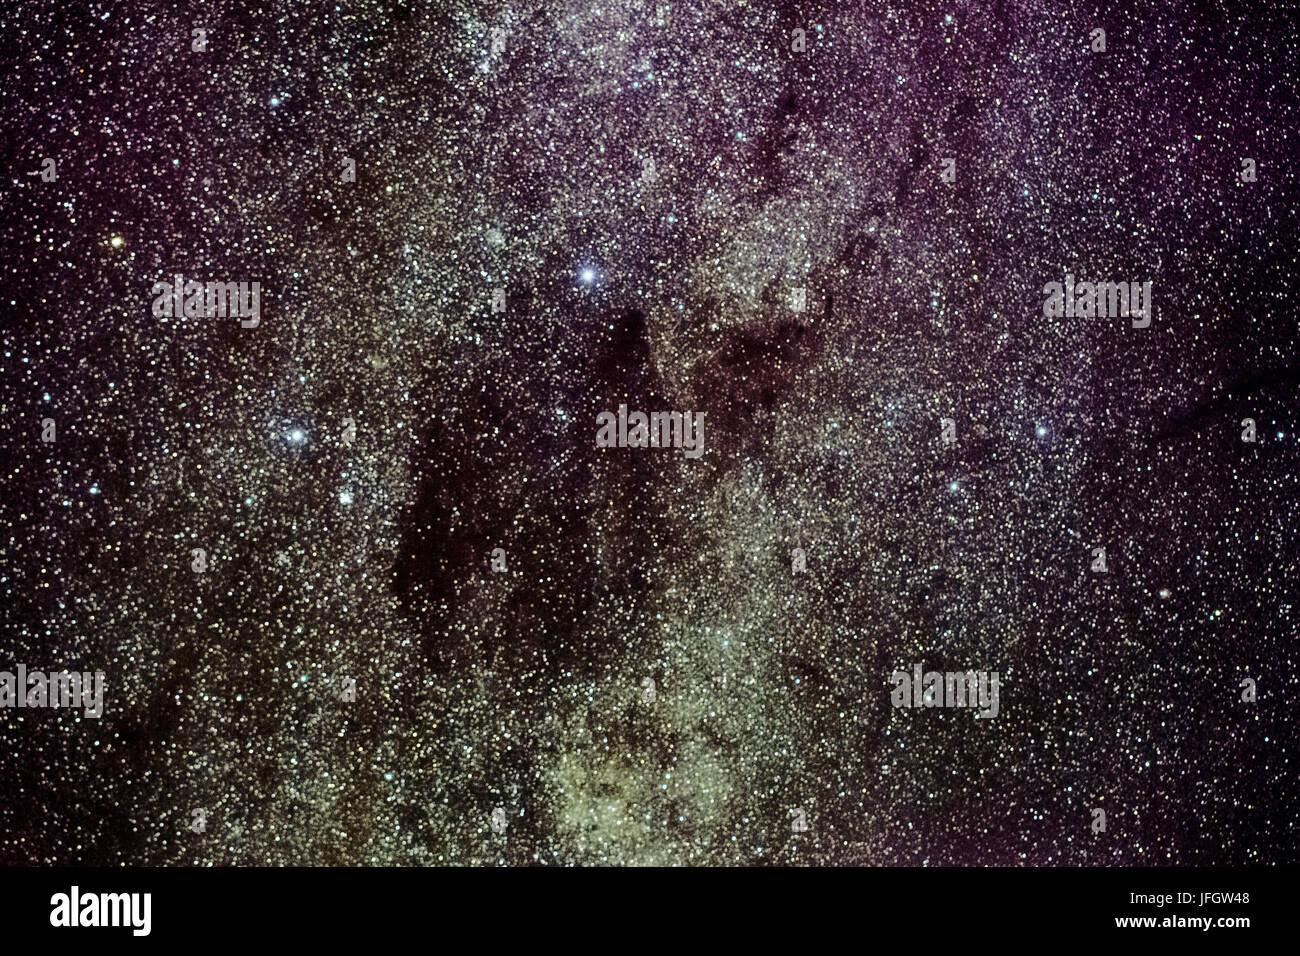 Chile, San Pedro de Atacama, stars, coal pouch, cross of the south, Deep Sky Stacking - Stock Image